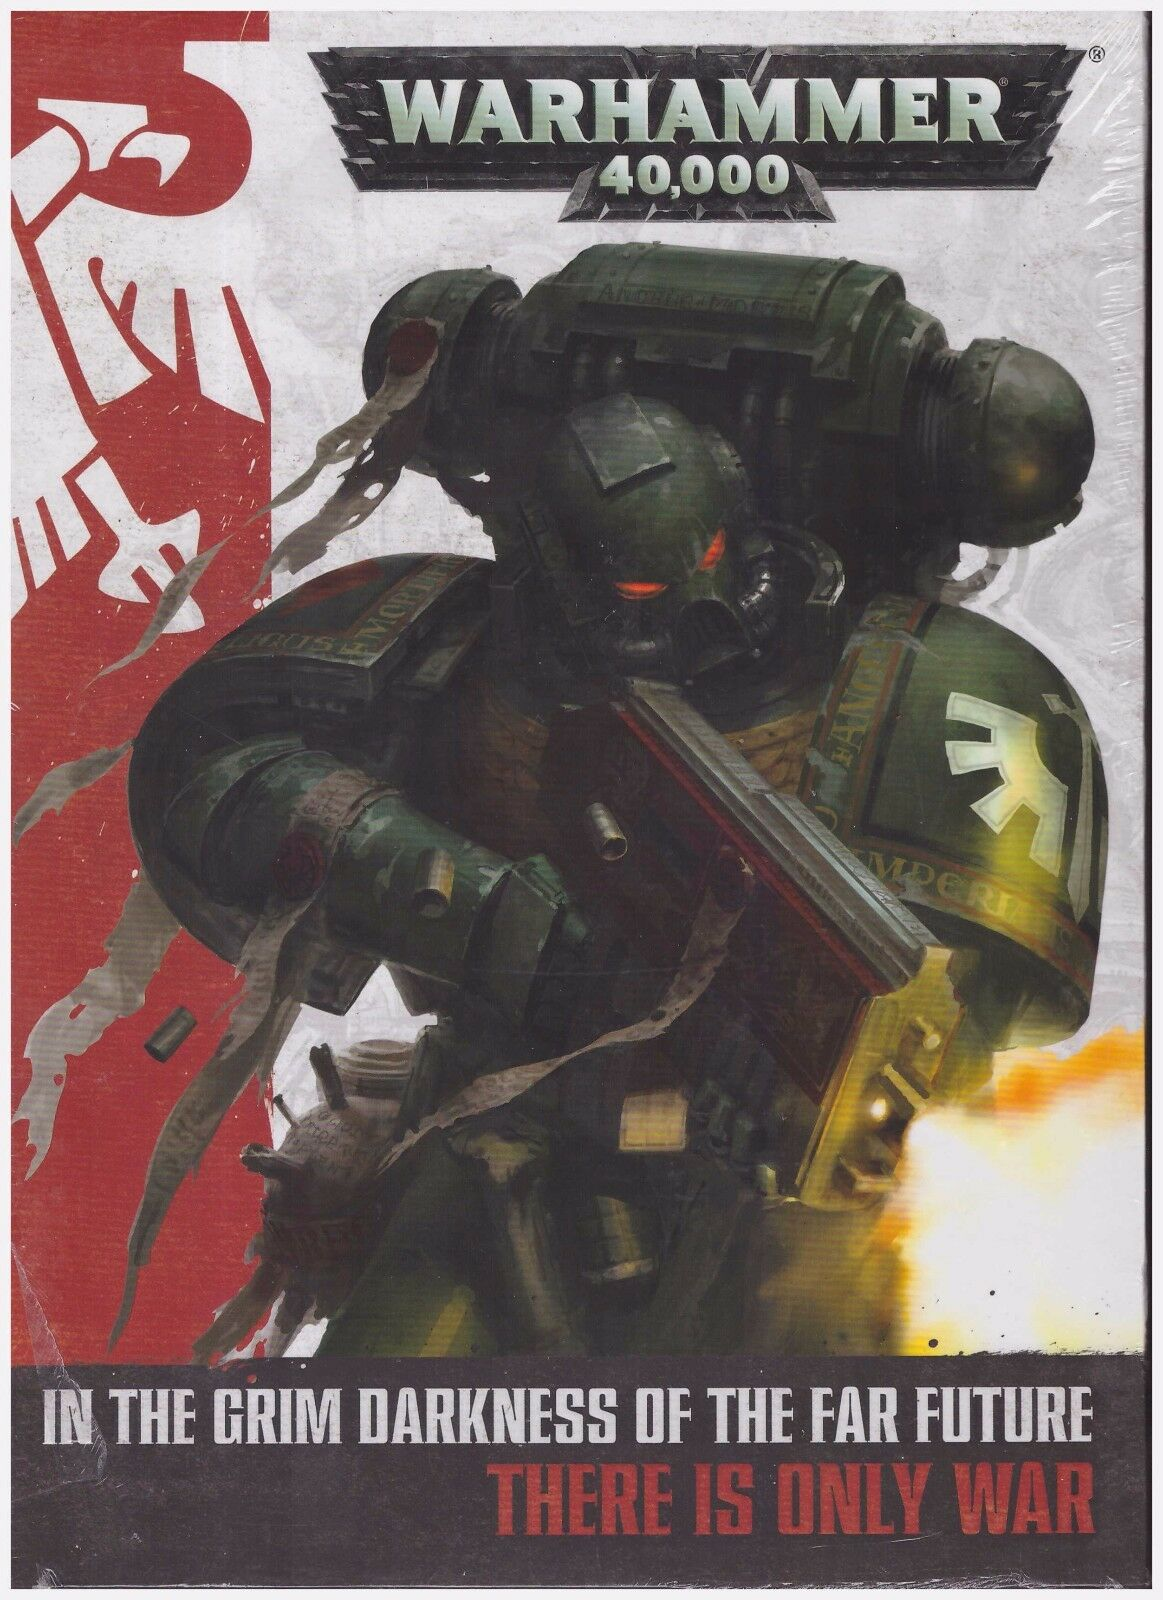 GW WARHAMMER 40K Warhammer 40,000 reglas (7th edición Estuche Set) Box Set SW